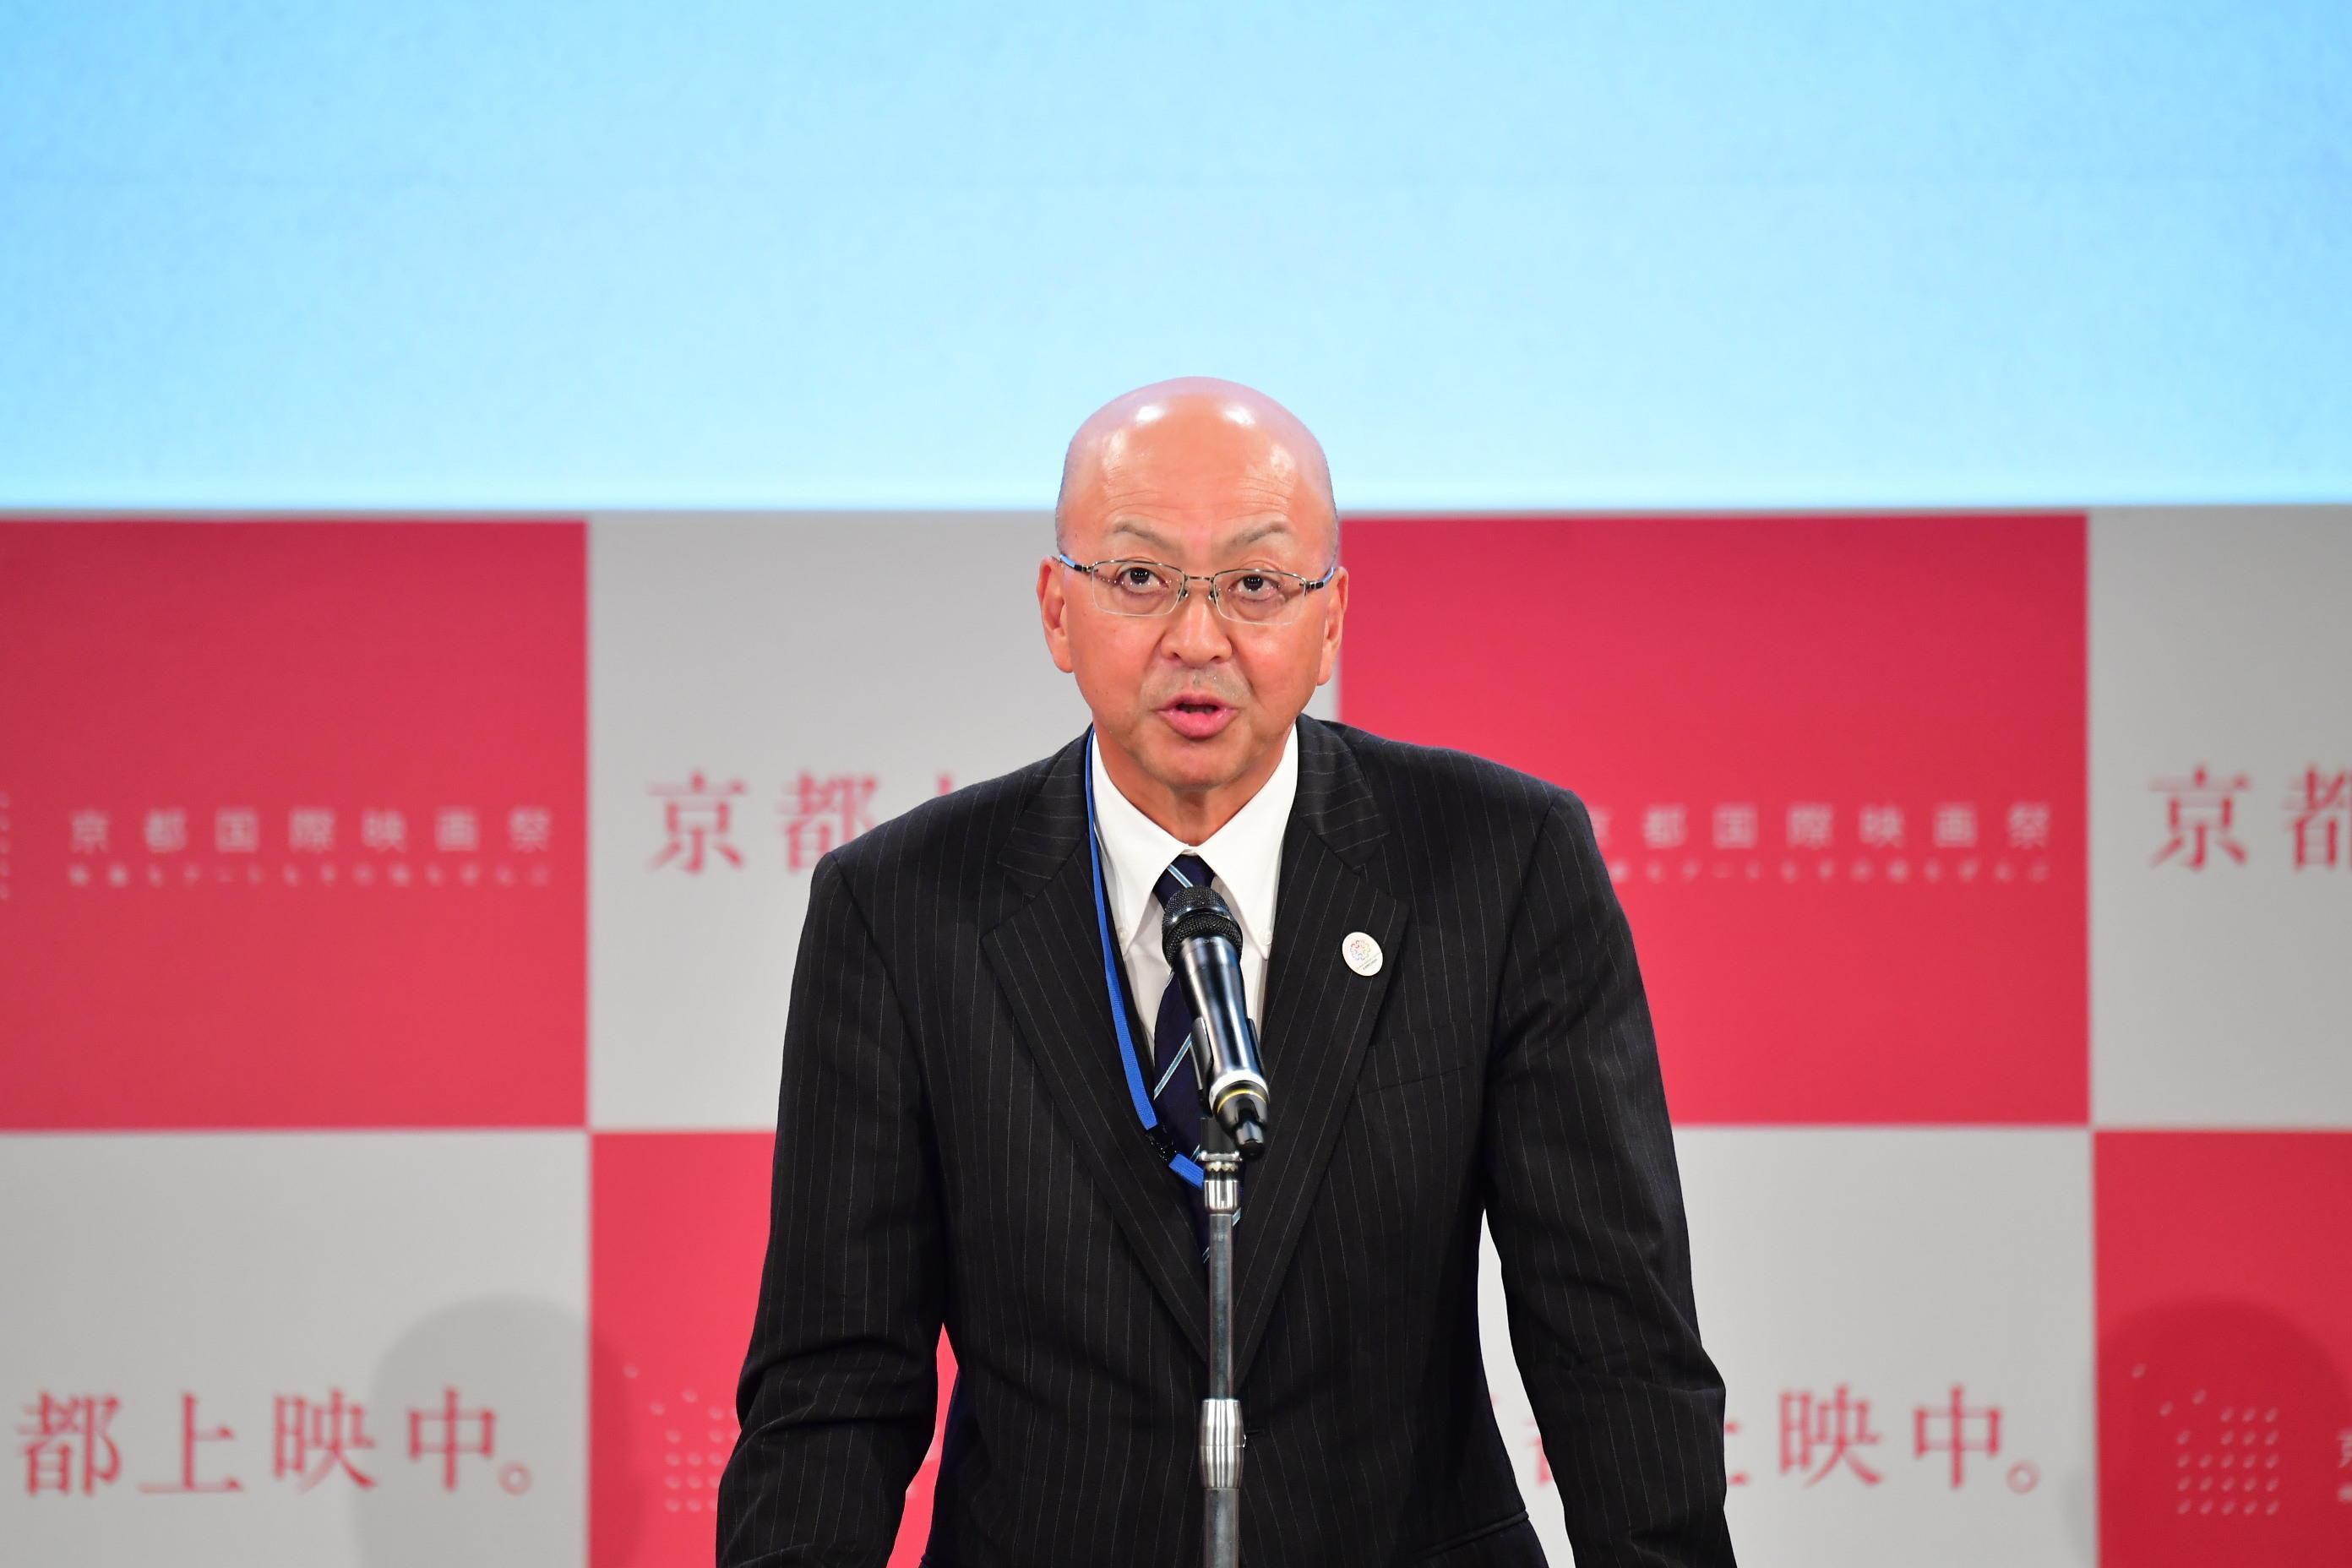 http://news.yoshimoto.co.jp/20180903234153-7ccae7e3b8701d9bce7f38446a7ce2cc45bbac5e.jpg